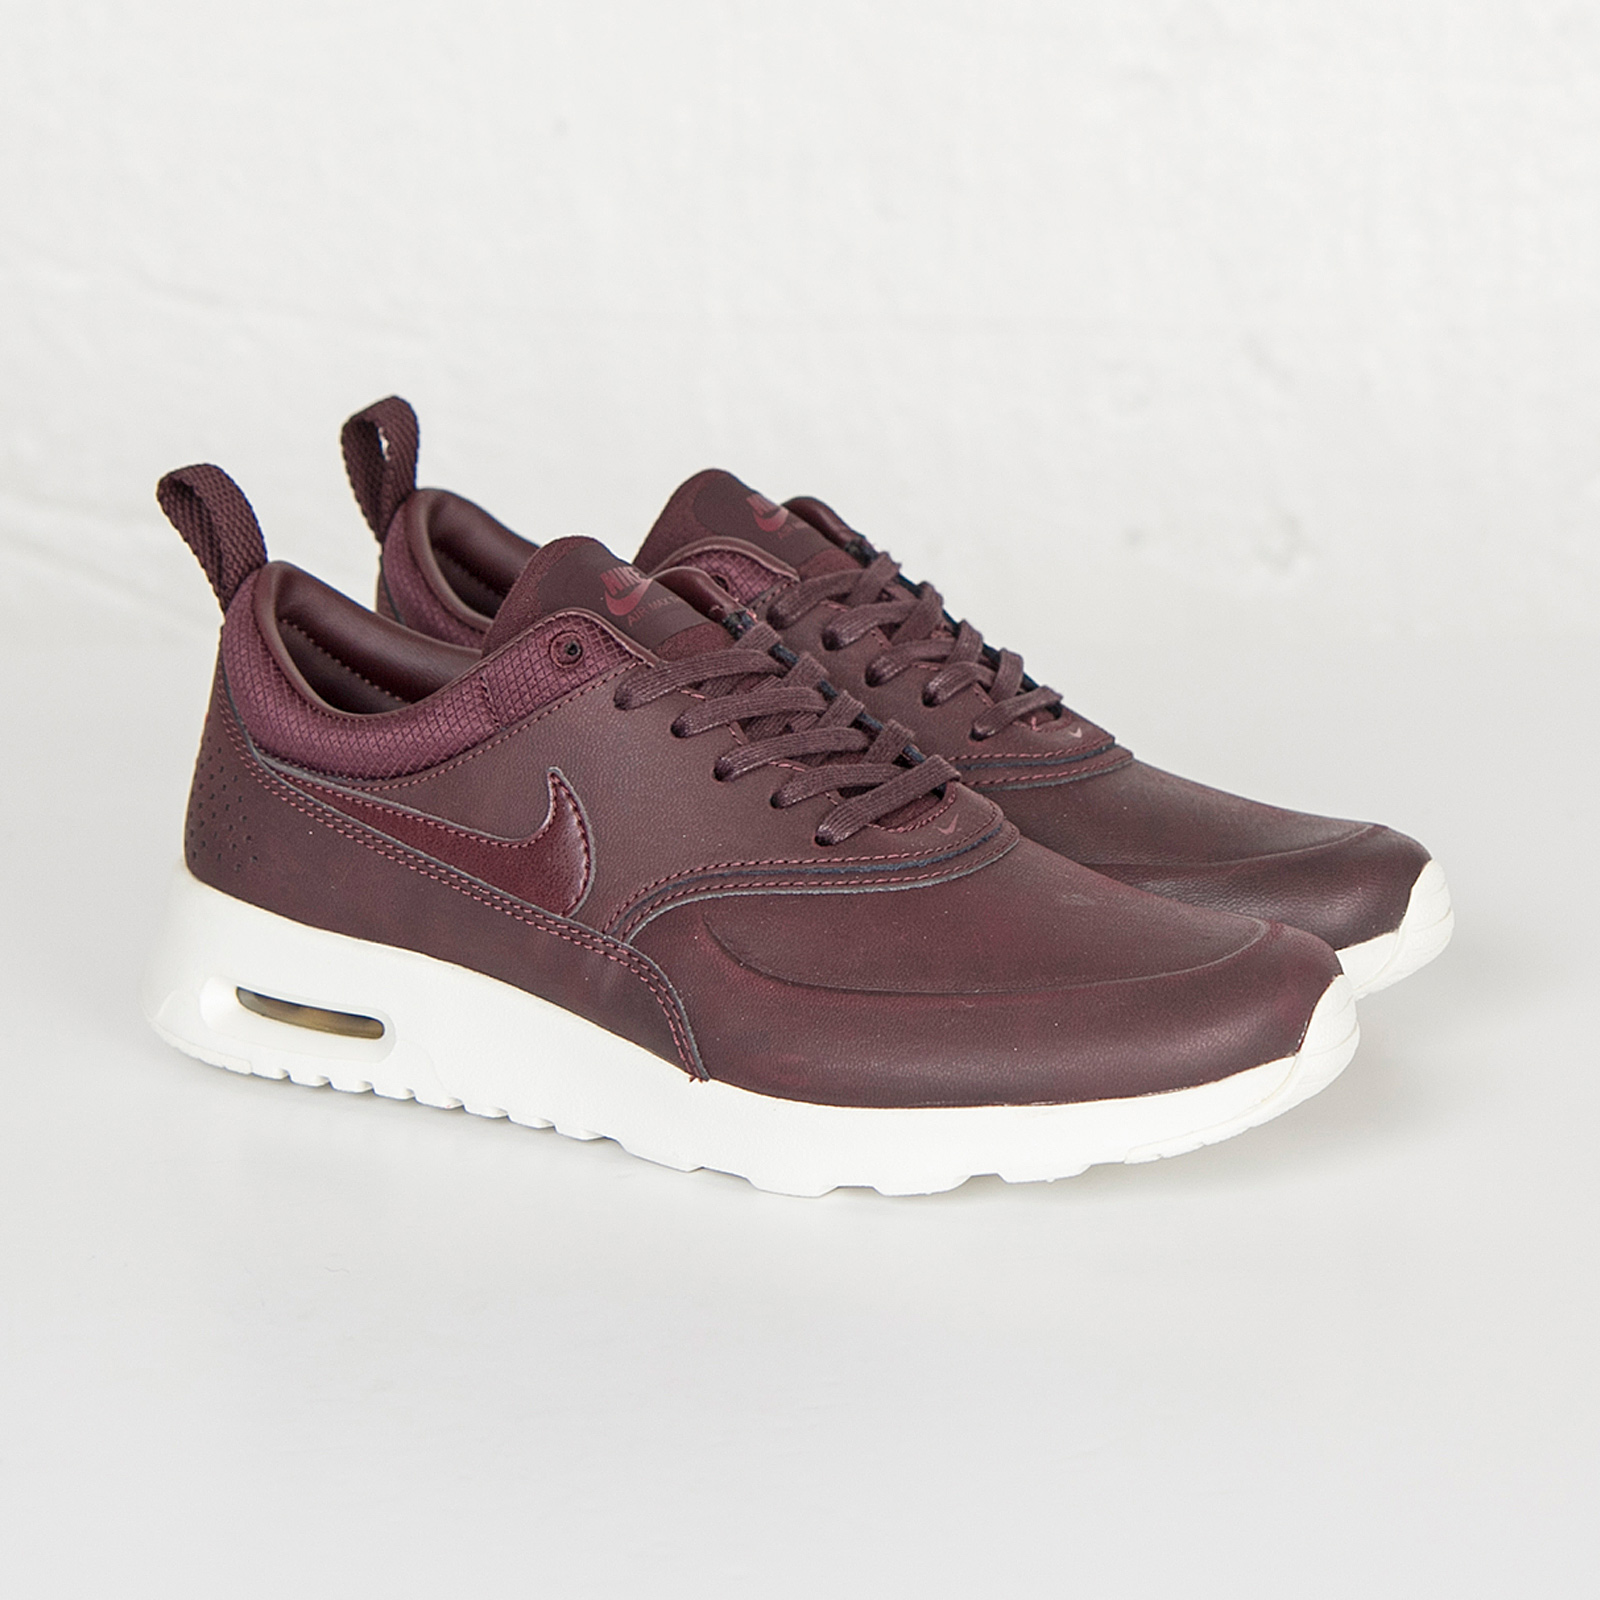 info for 02ca9 7fffd Nike Wmns Air Max Thea Premium - 616723-200 - Sneakersnstuff ...